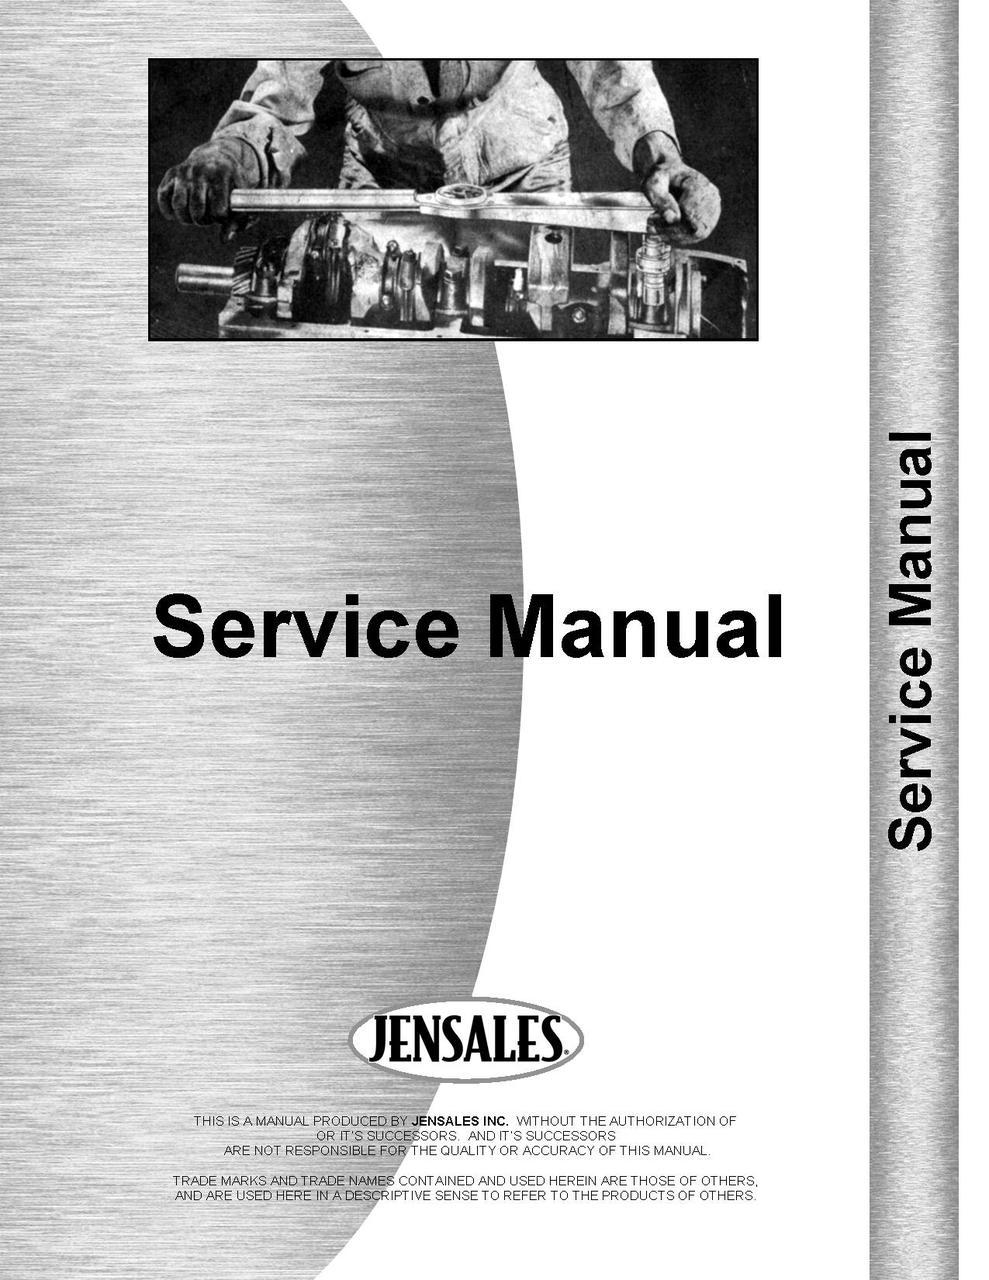 simplicity 4041 lawn garden tractor onan engine service manual rh agkits com Onan CCK Engine onan engine service manual cckb